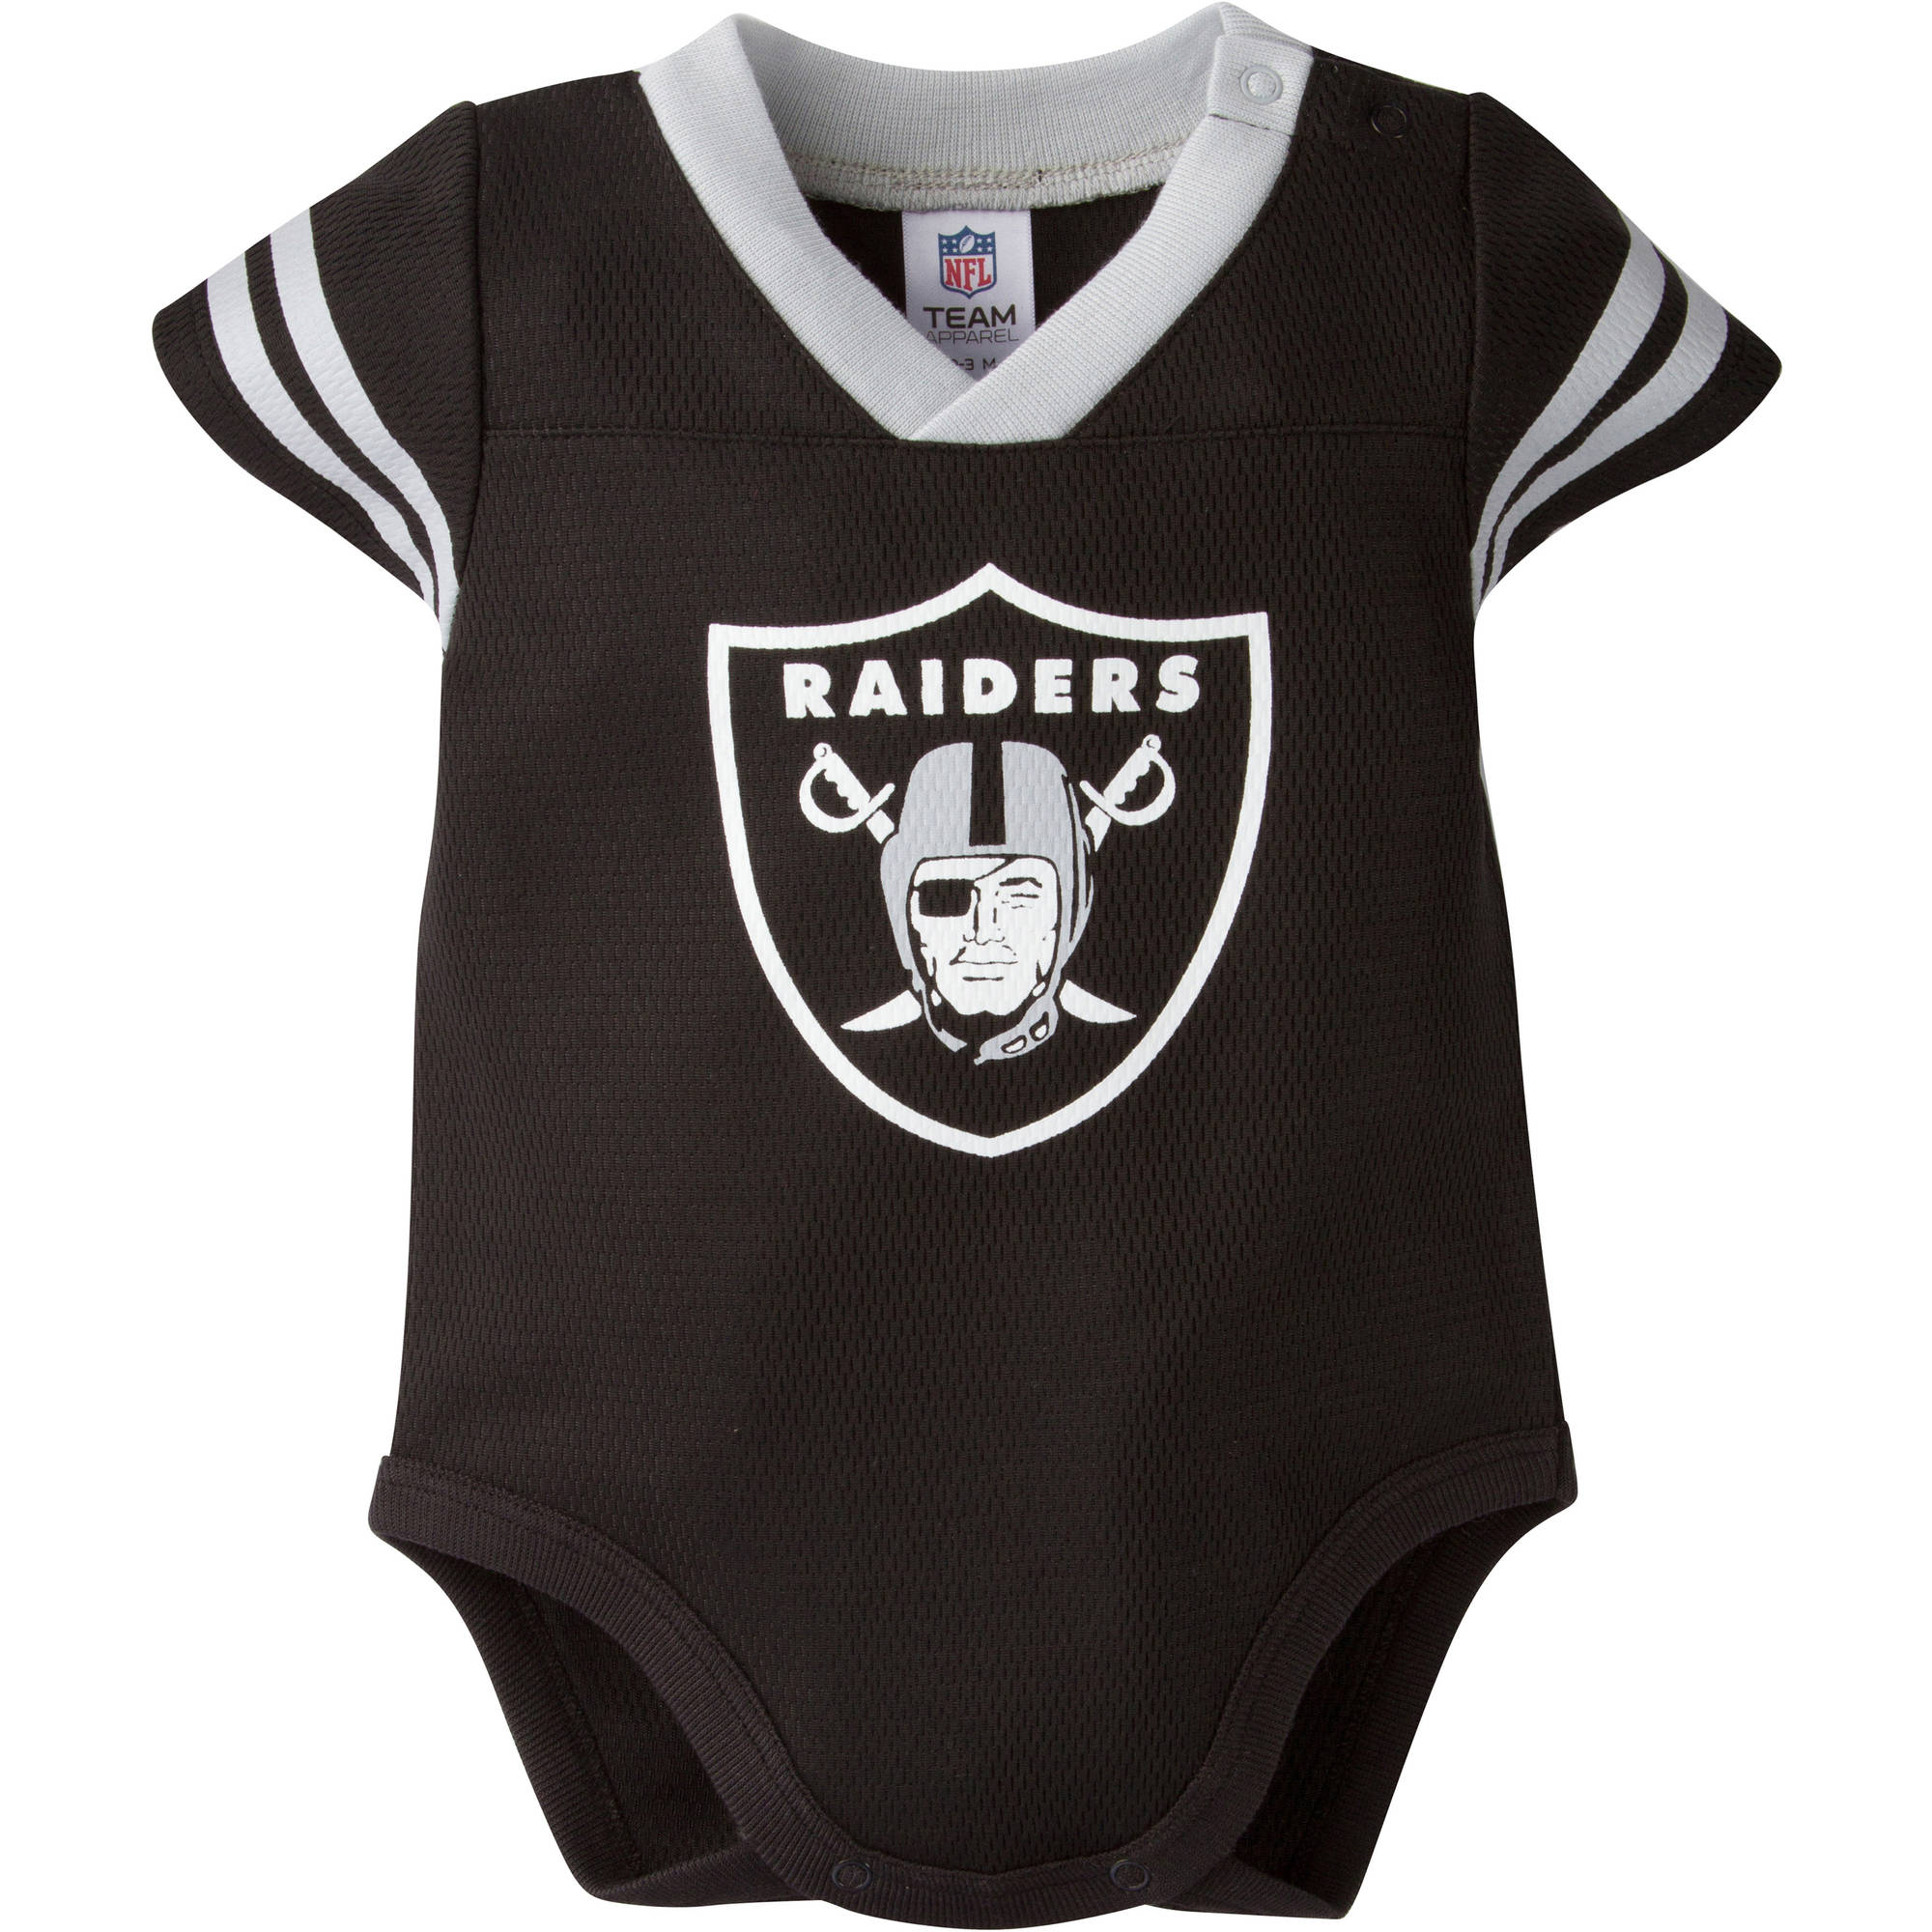 3b45cf8a9 Oakland Raiders Dazzle Bodysuit - Walmart.com